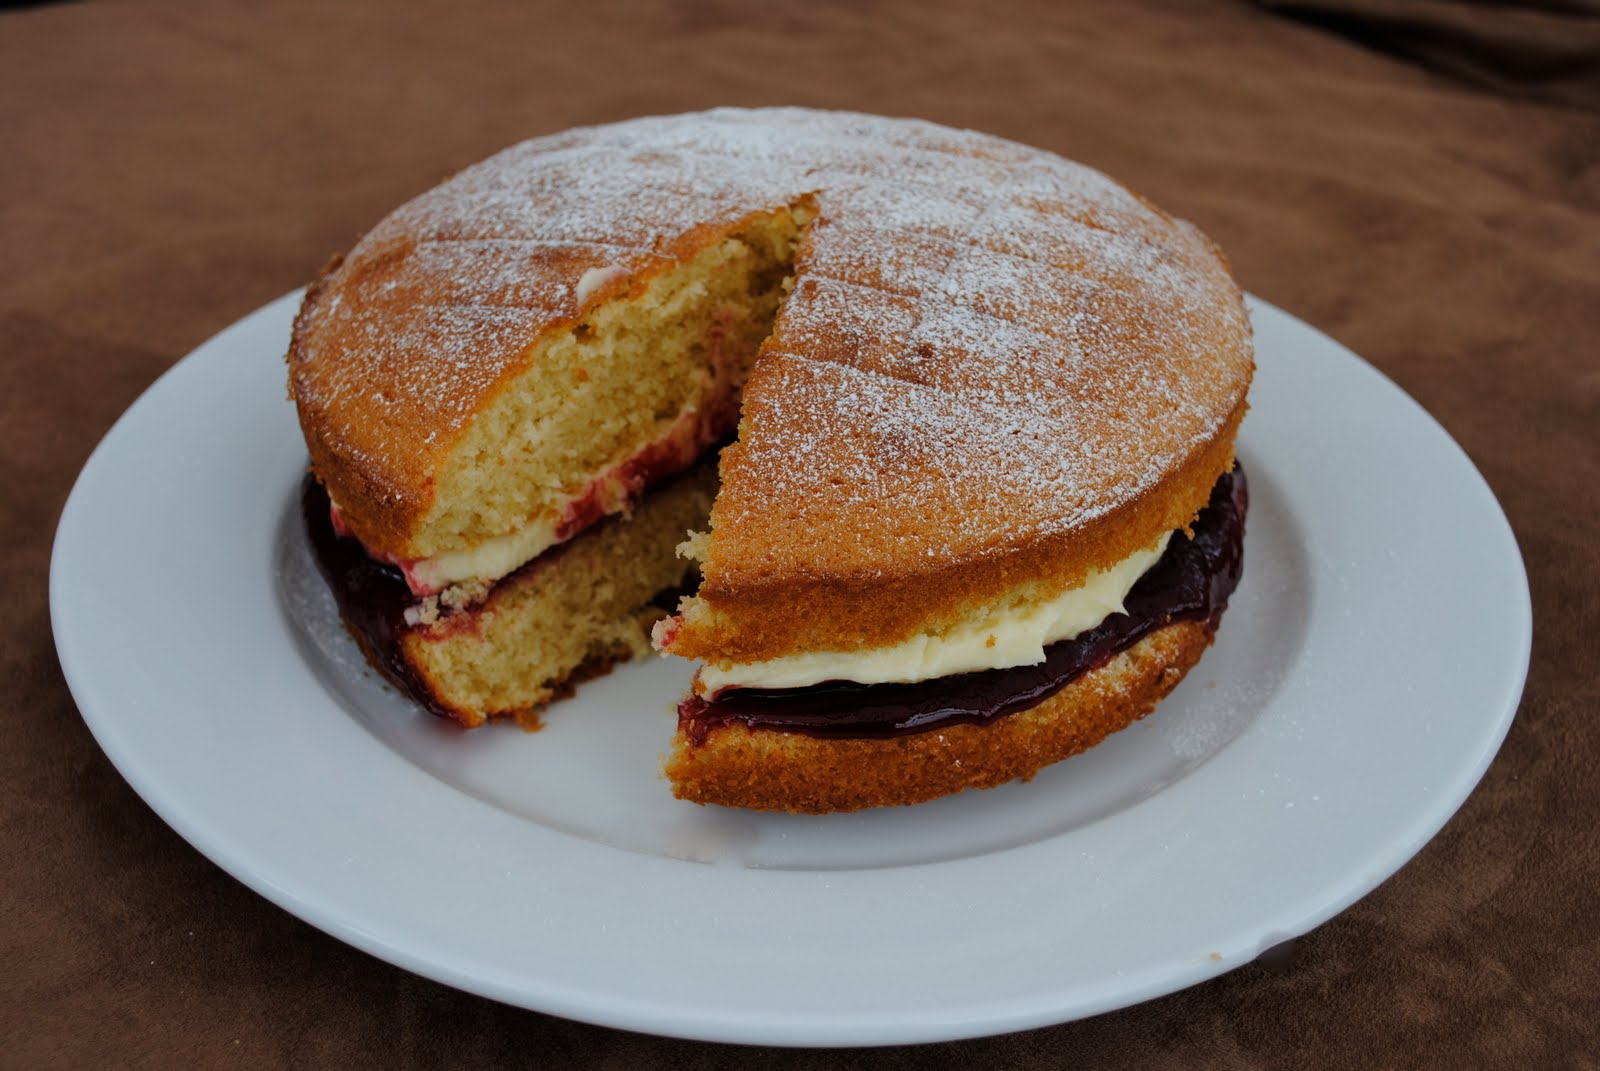 Cake baking demonstration in Brownhills this Thursday  Get